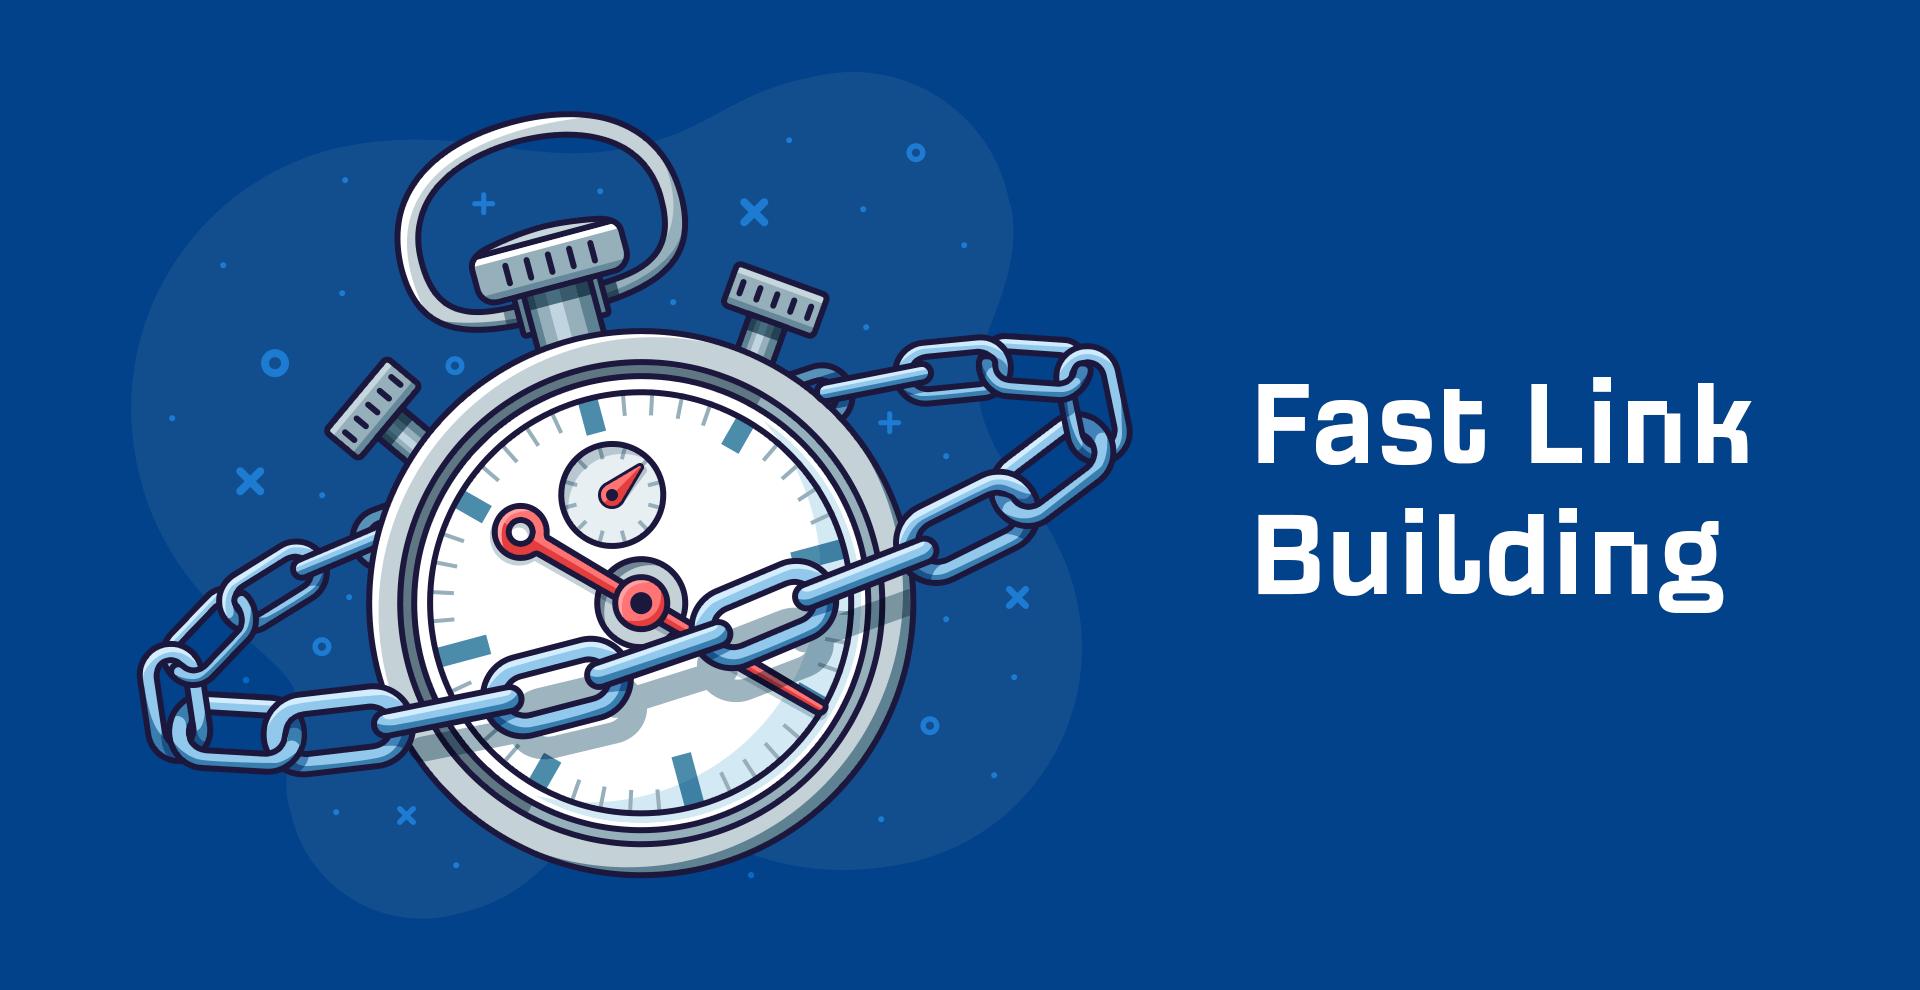 fb fast link building